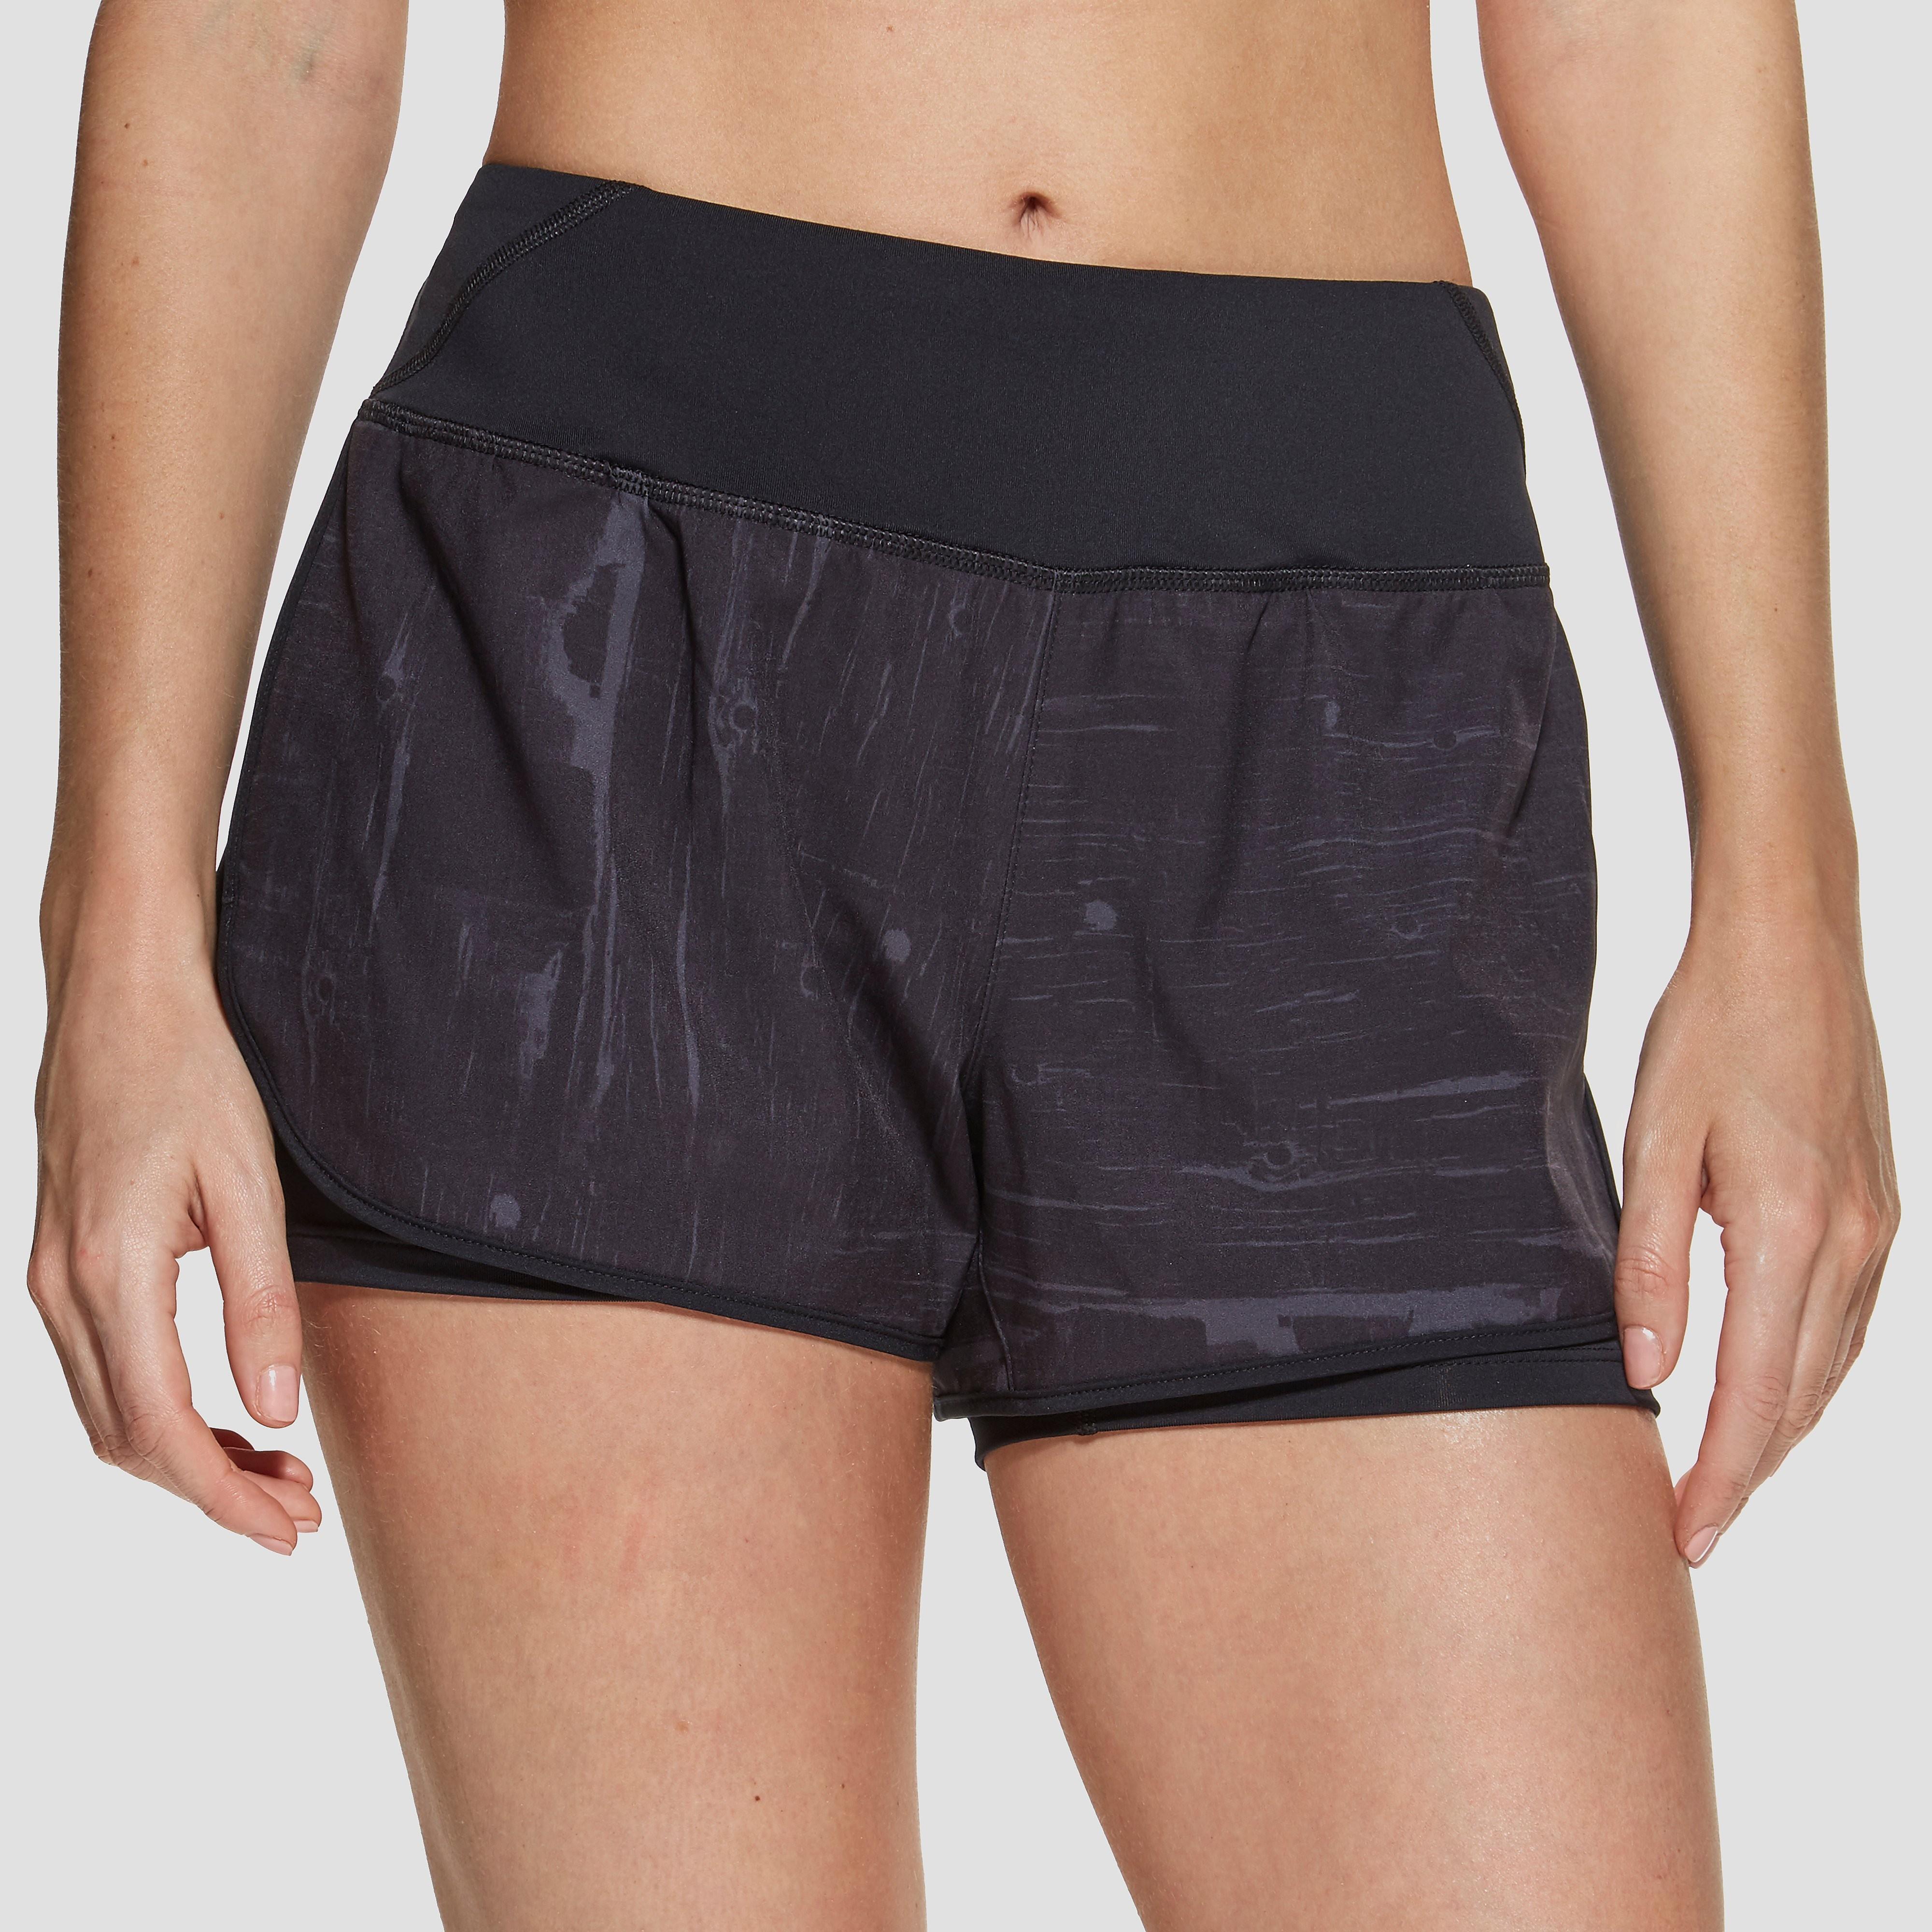 Beachbody Women's Flex 2-in-1 Shorts